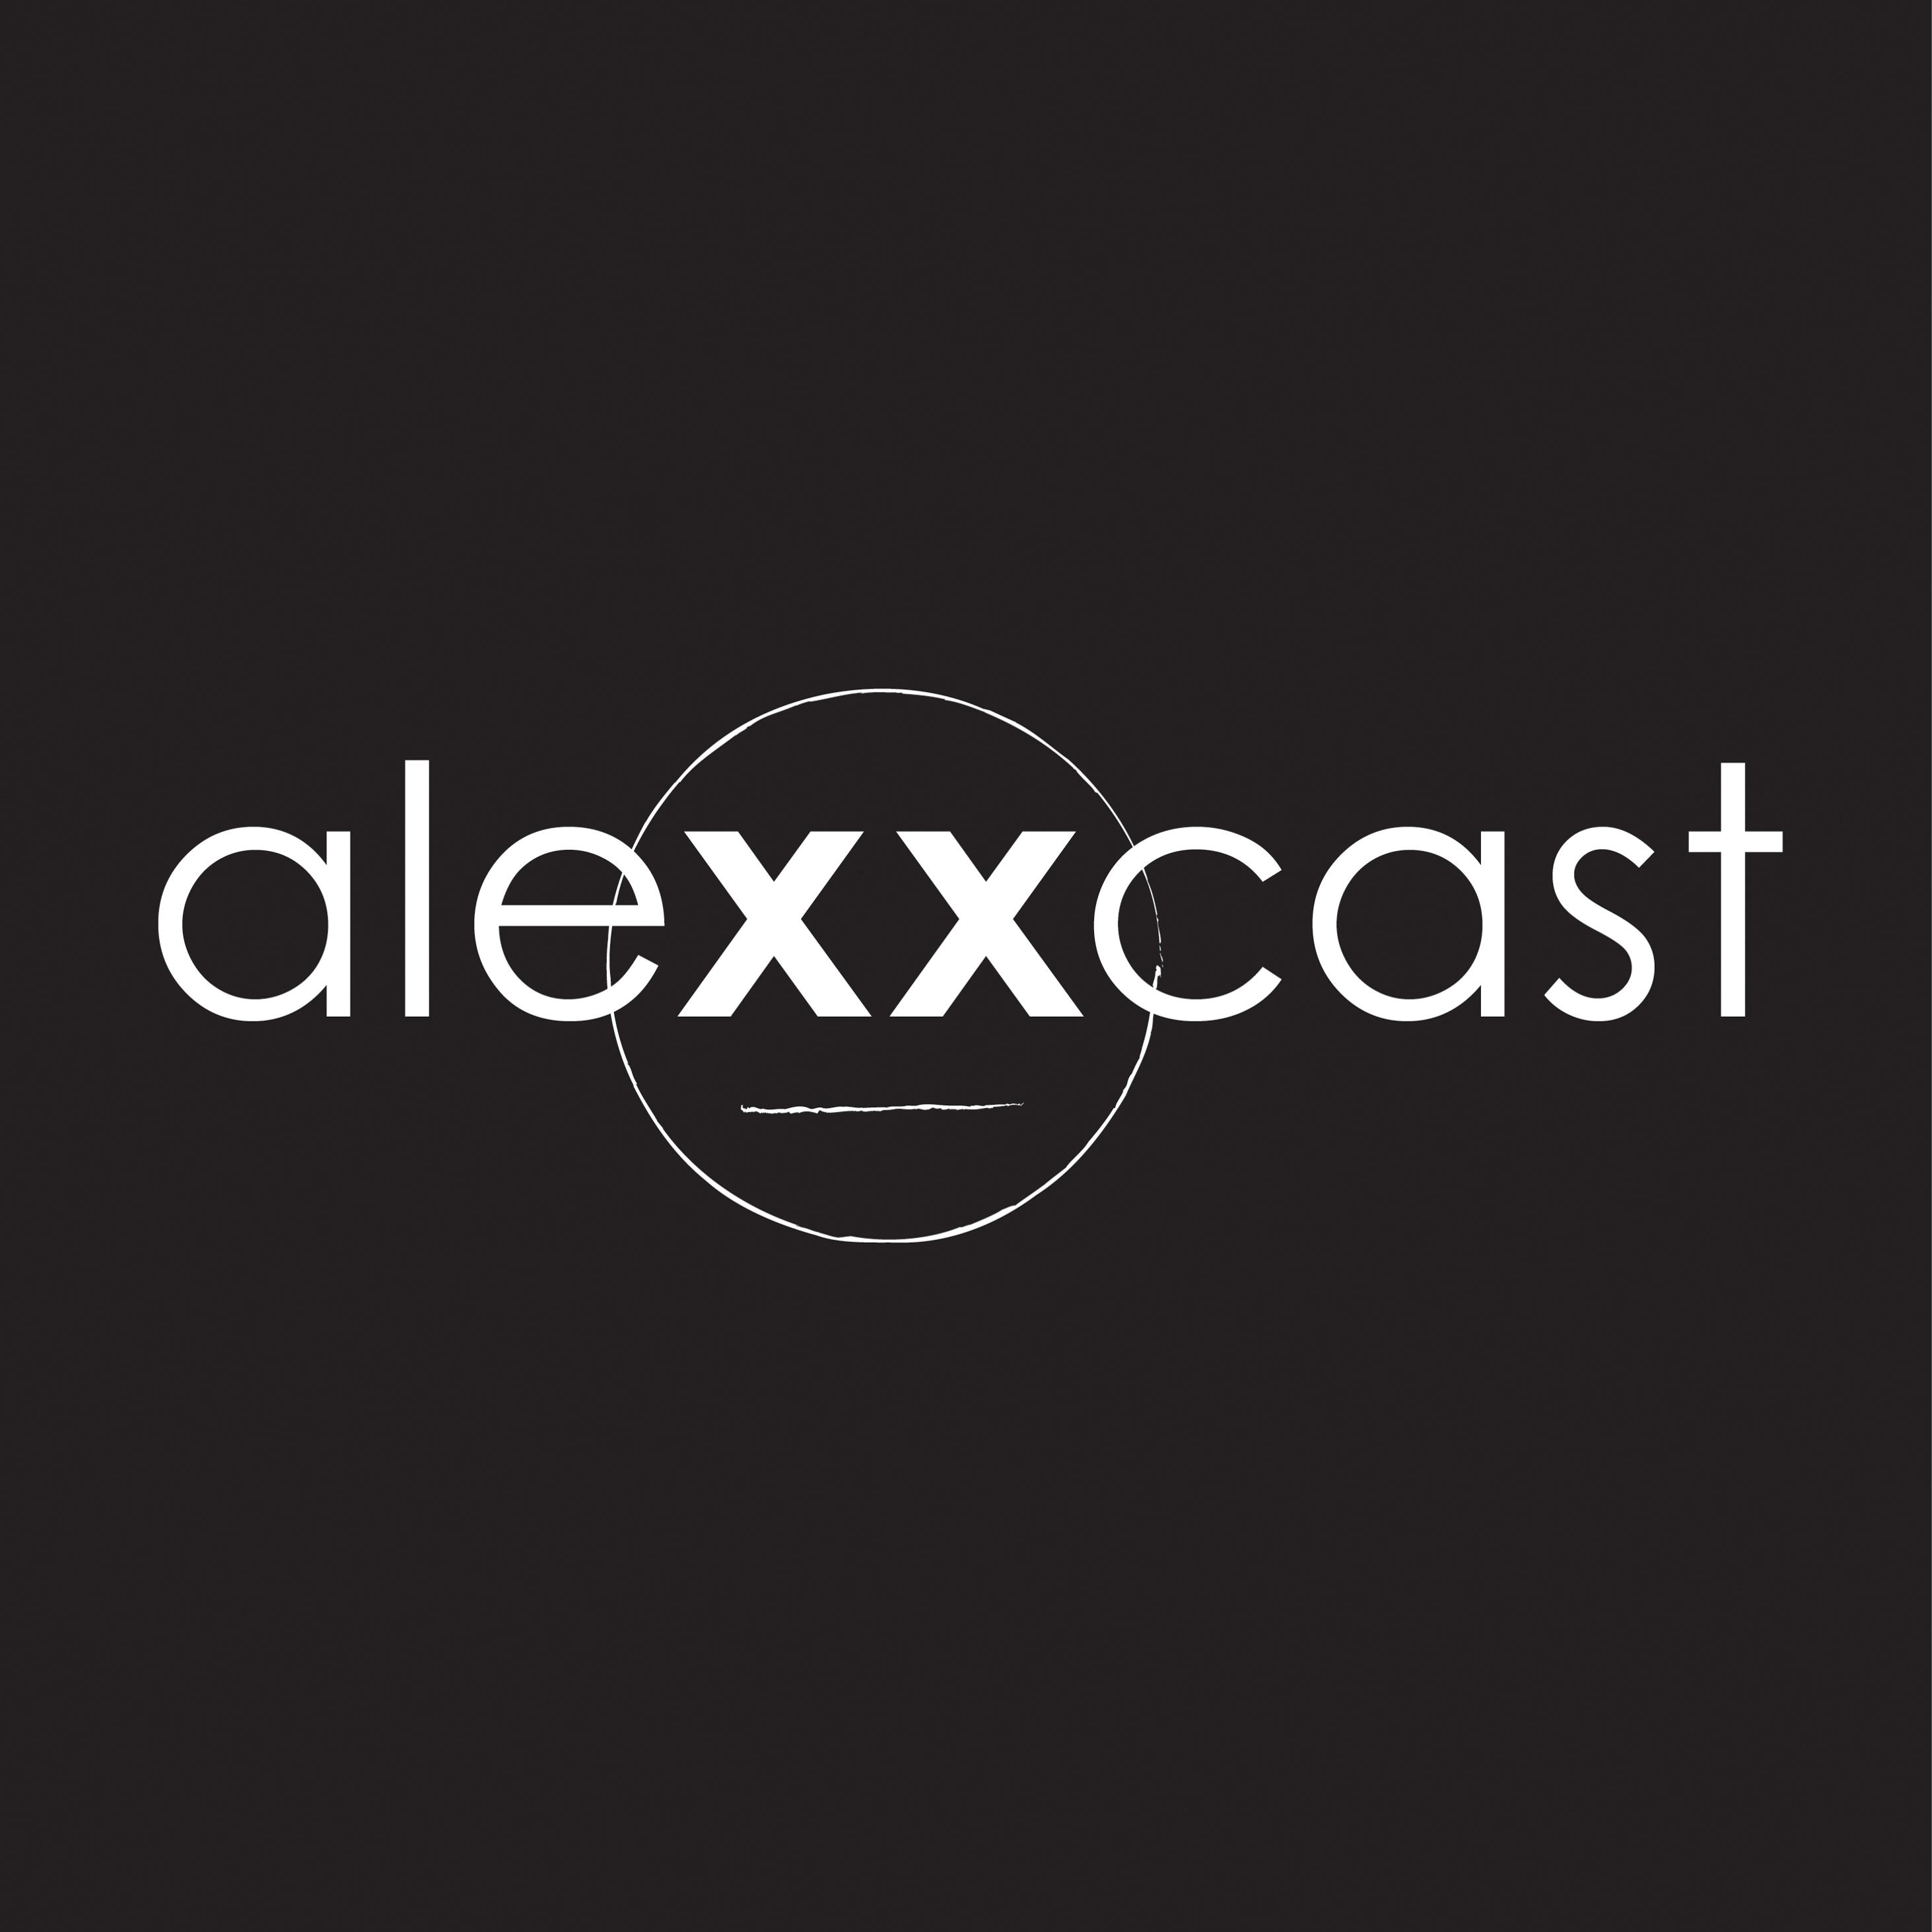 The Alexxcast